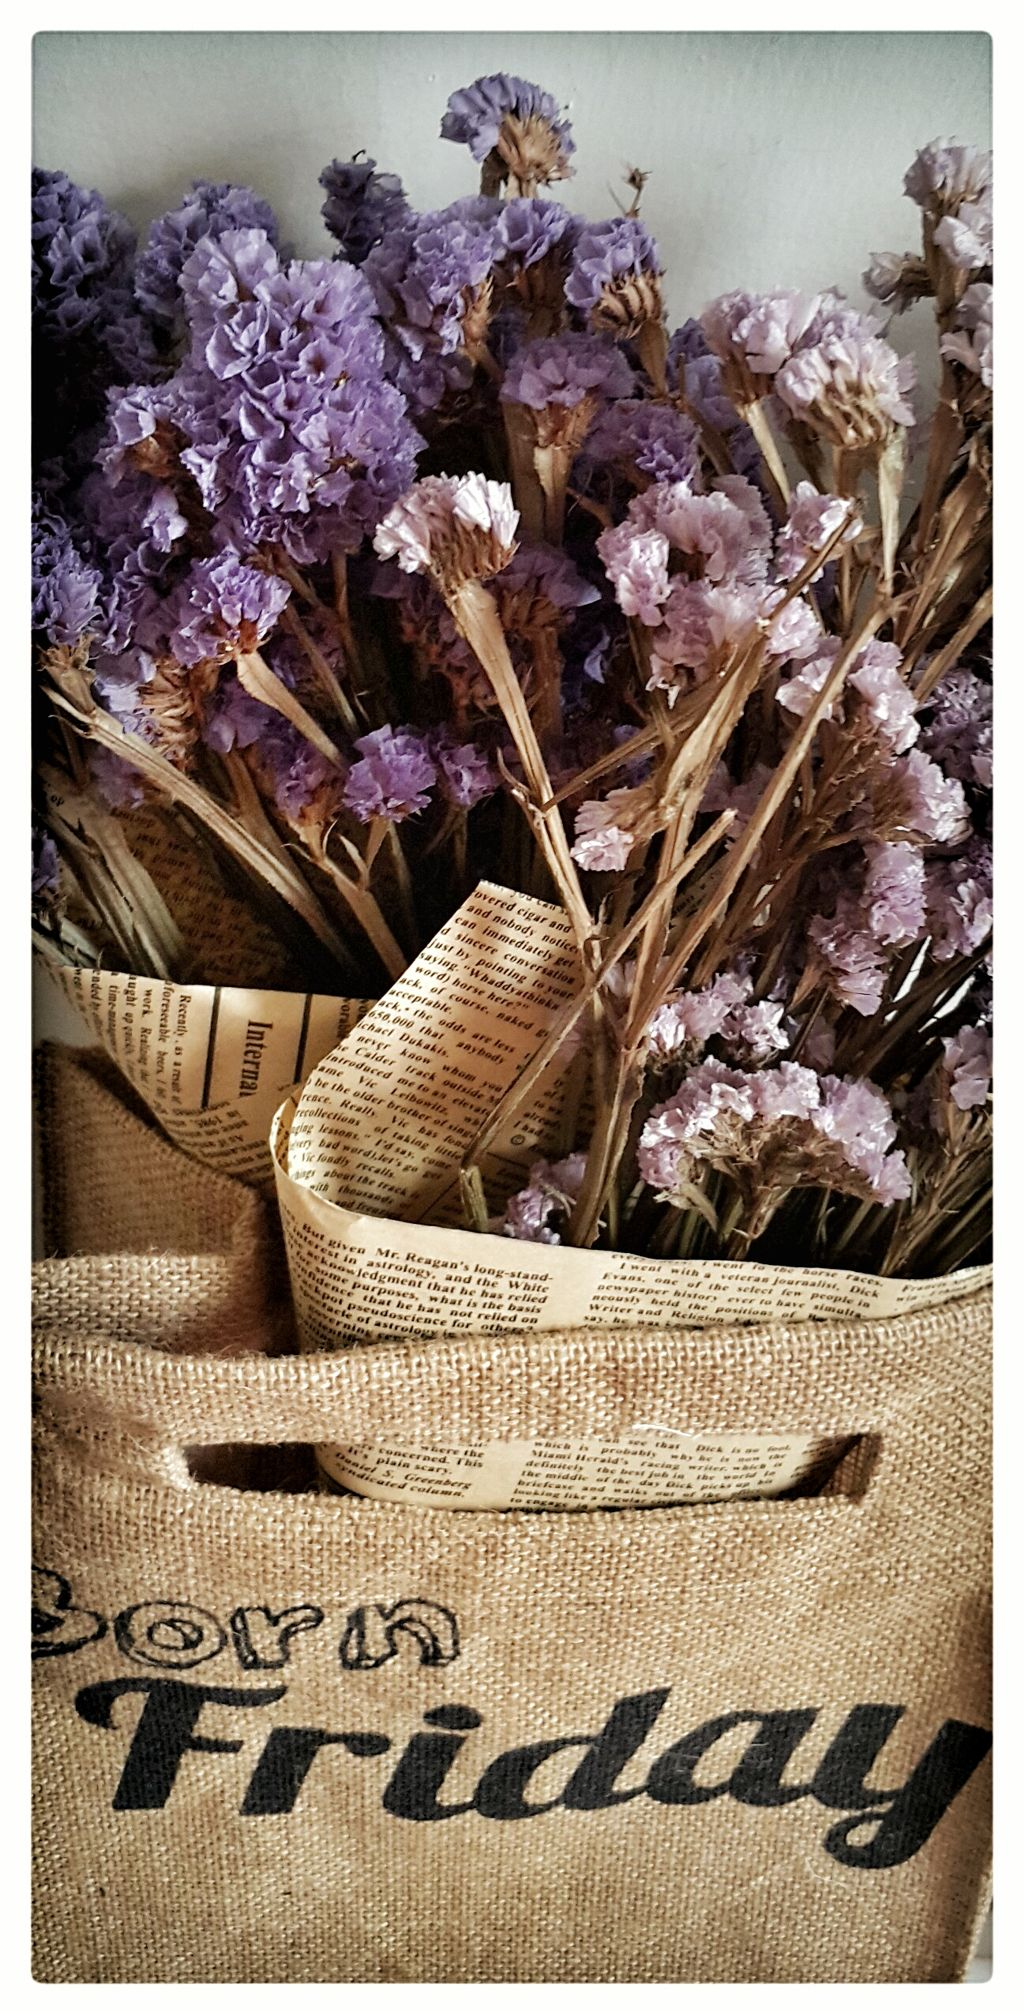 Do not miss friday again 😄😄😄 #haveaniceday #dryflower #womaninlove #happy #happyday